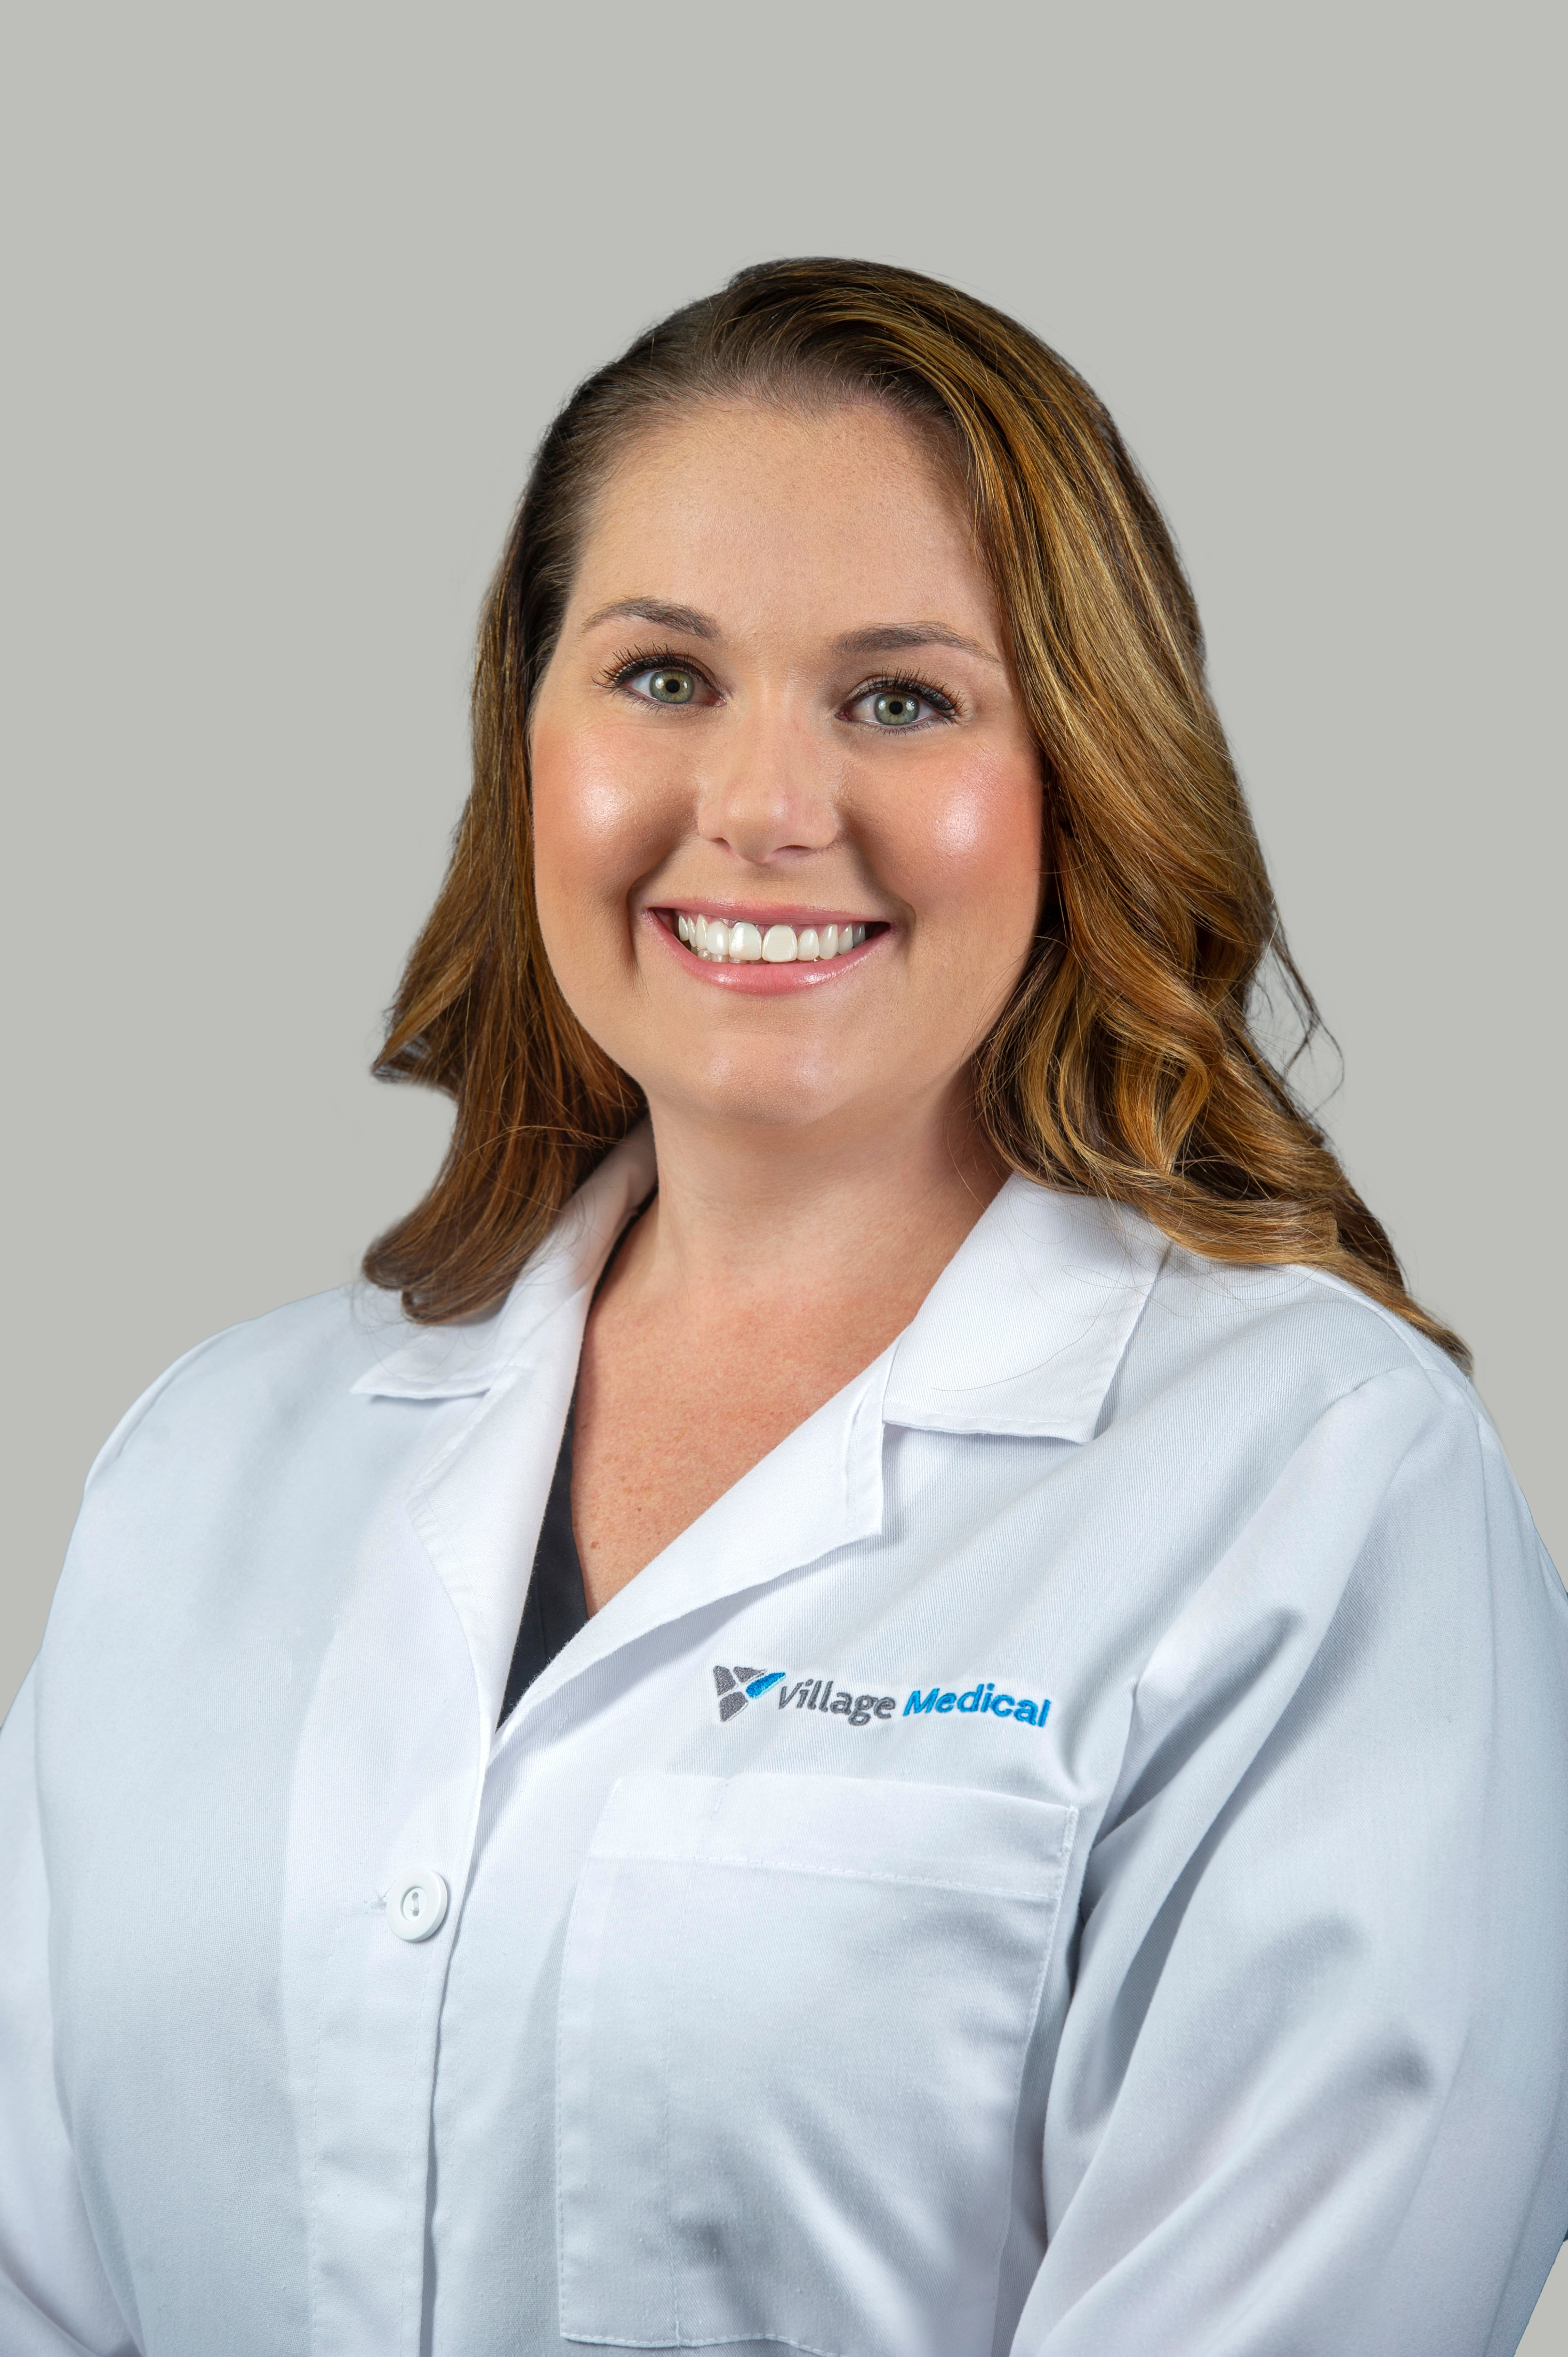 Tracy L. Anselmo, FNP-BC